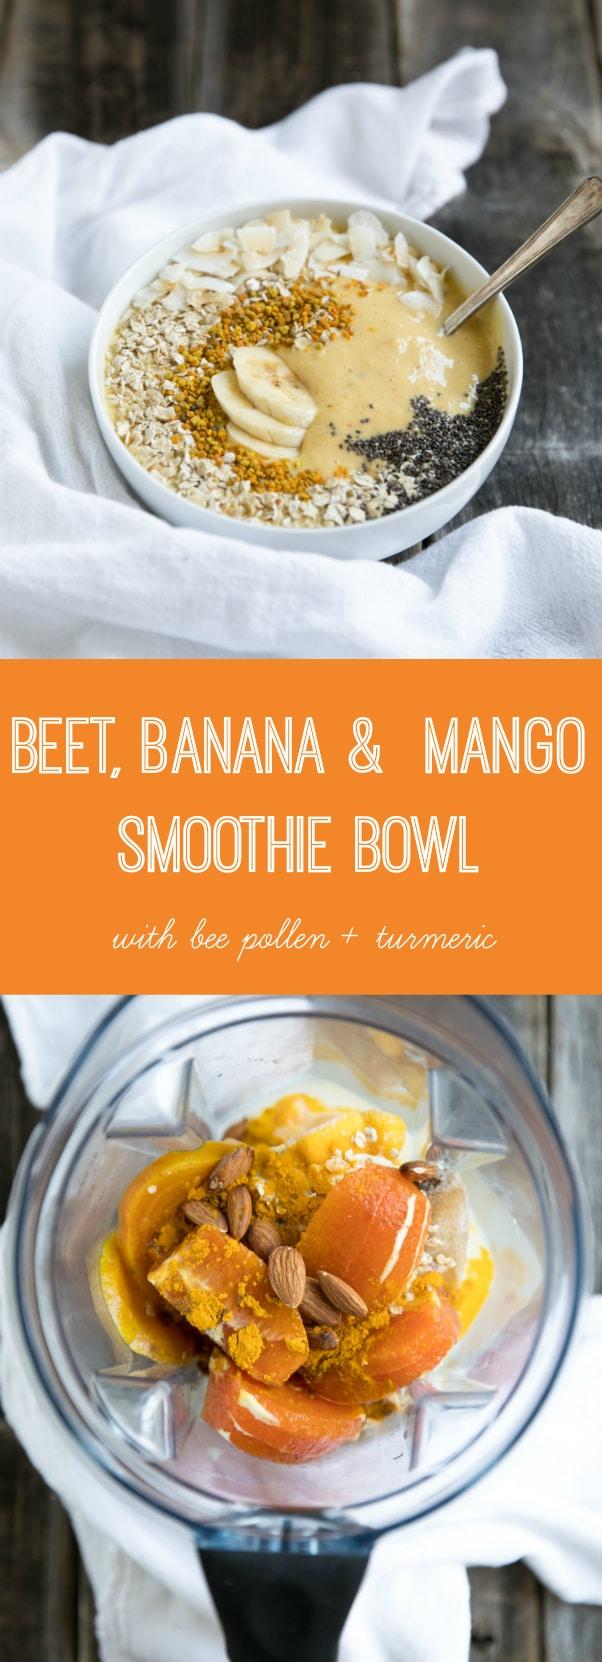 Banana Mango Smoothie Bowls with Bee Pollen and Turmeric @theforkedspoon #smoothie #turmeric #breakfast #healthy #theforkedspoon #glutenfree #dairyfree